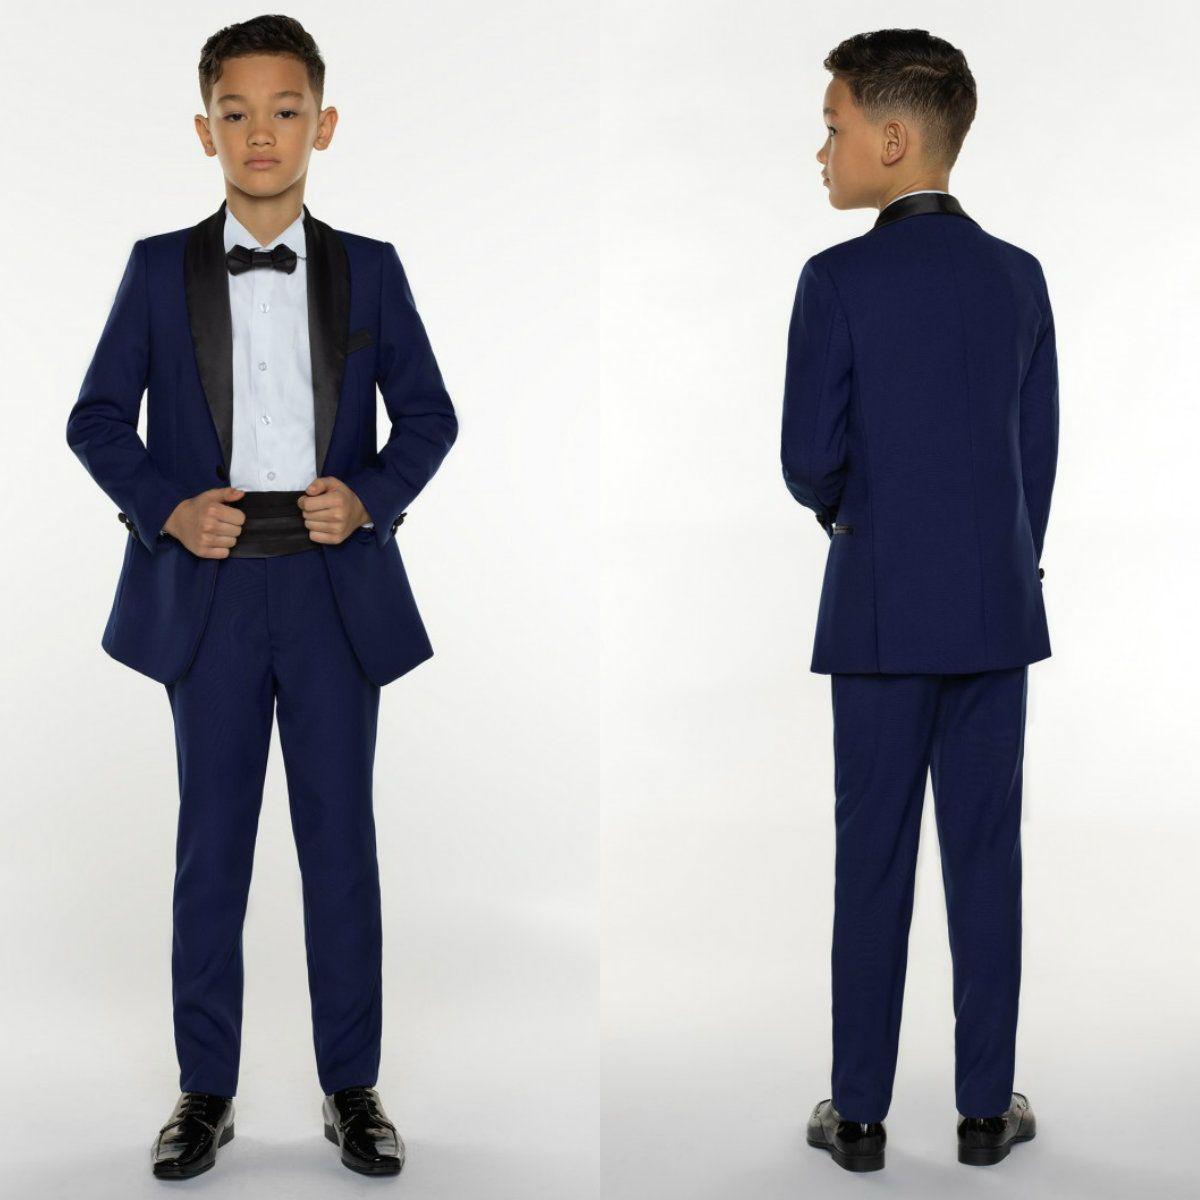 Boys Tuxedo Boys Dinner Boys Formal Suits Tuxedo for Kids Tuxedo Formal Occasion Blue and Black Suits For Little Men (Jacket+Pants+Vest)